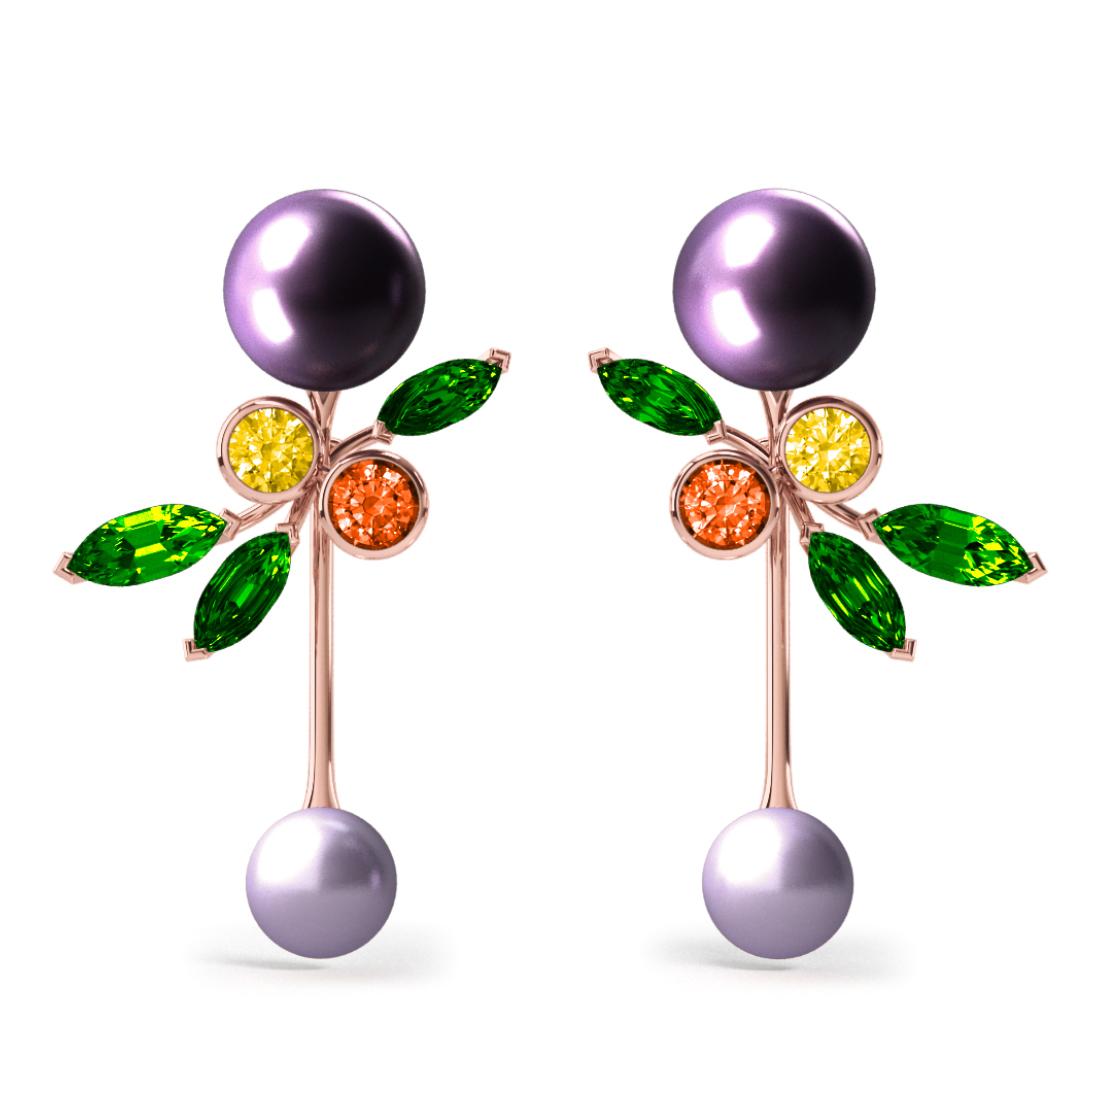 Boucles d'oreilles Pearly Angel Aubergine & Mauve - Saphirs, diamants, tsavorites & perles de Tahiti <br /> Or jaune 18 carats